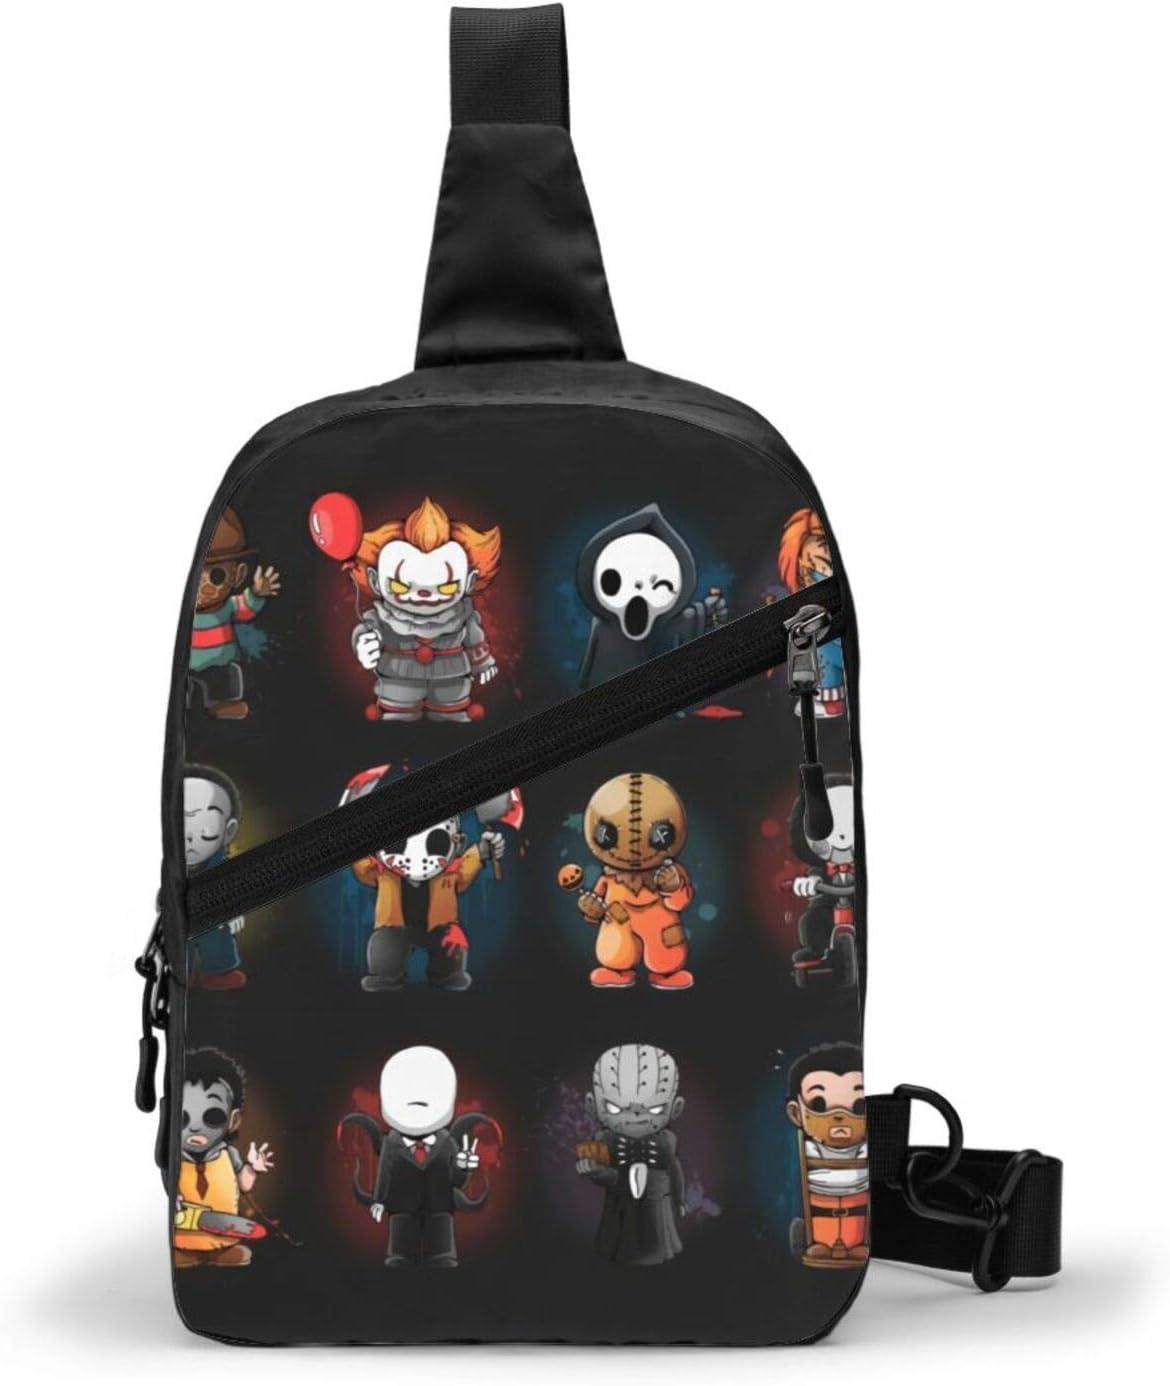 Mouthdodo Horror Movie Sling Bags Men Backpack 70% OFF Outlet Mi Shoulder Year-end gift Women